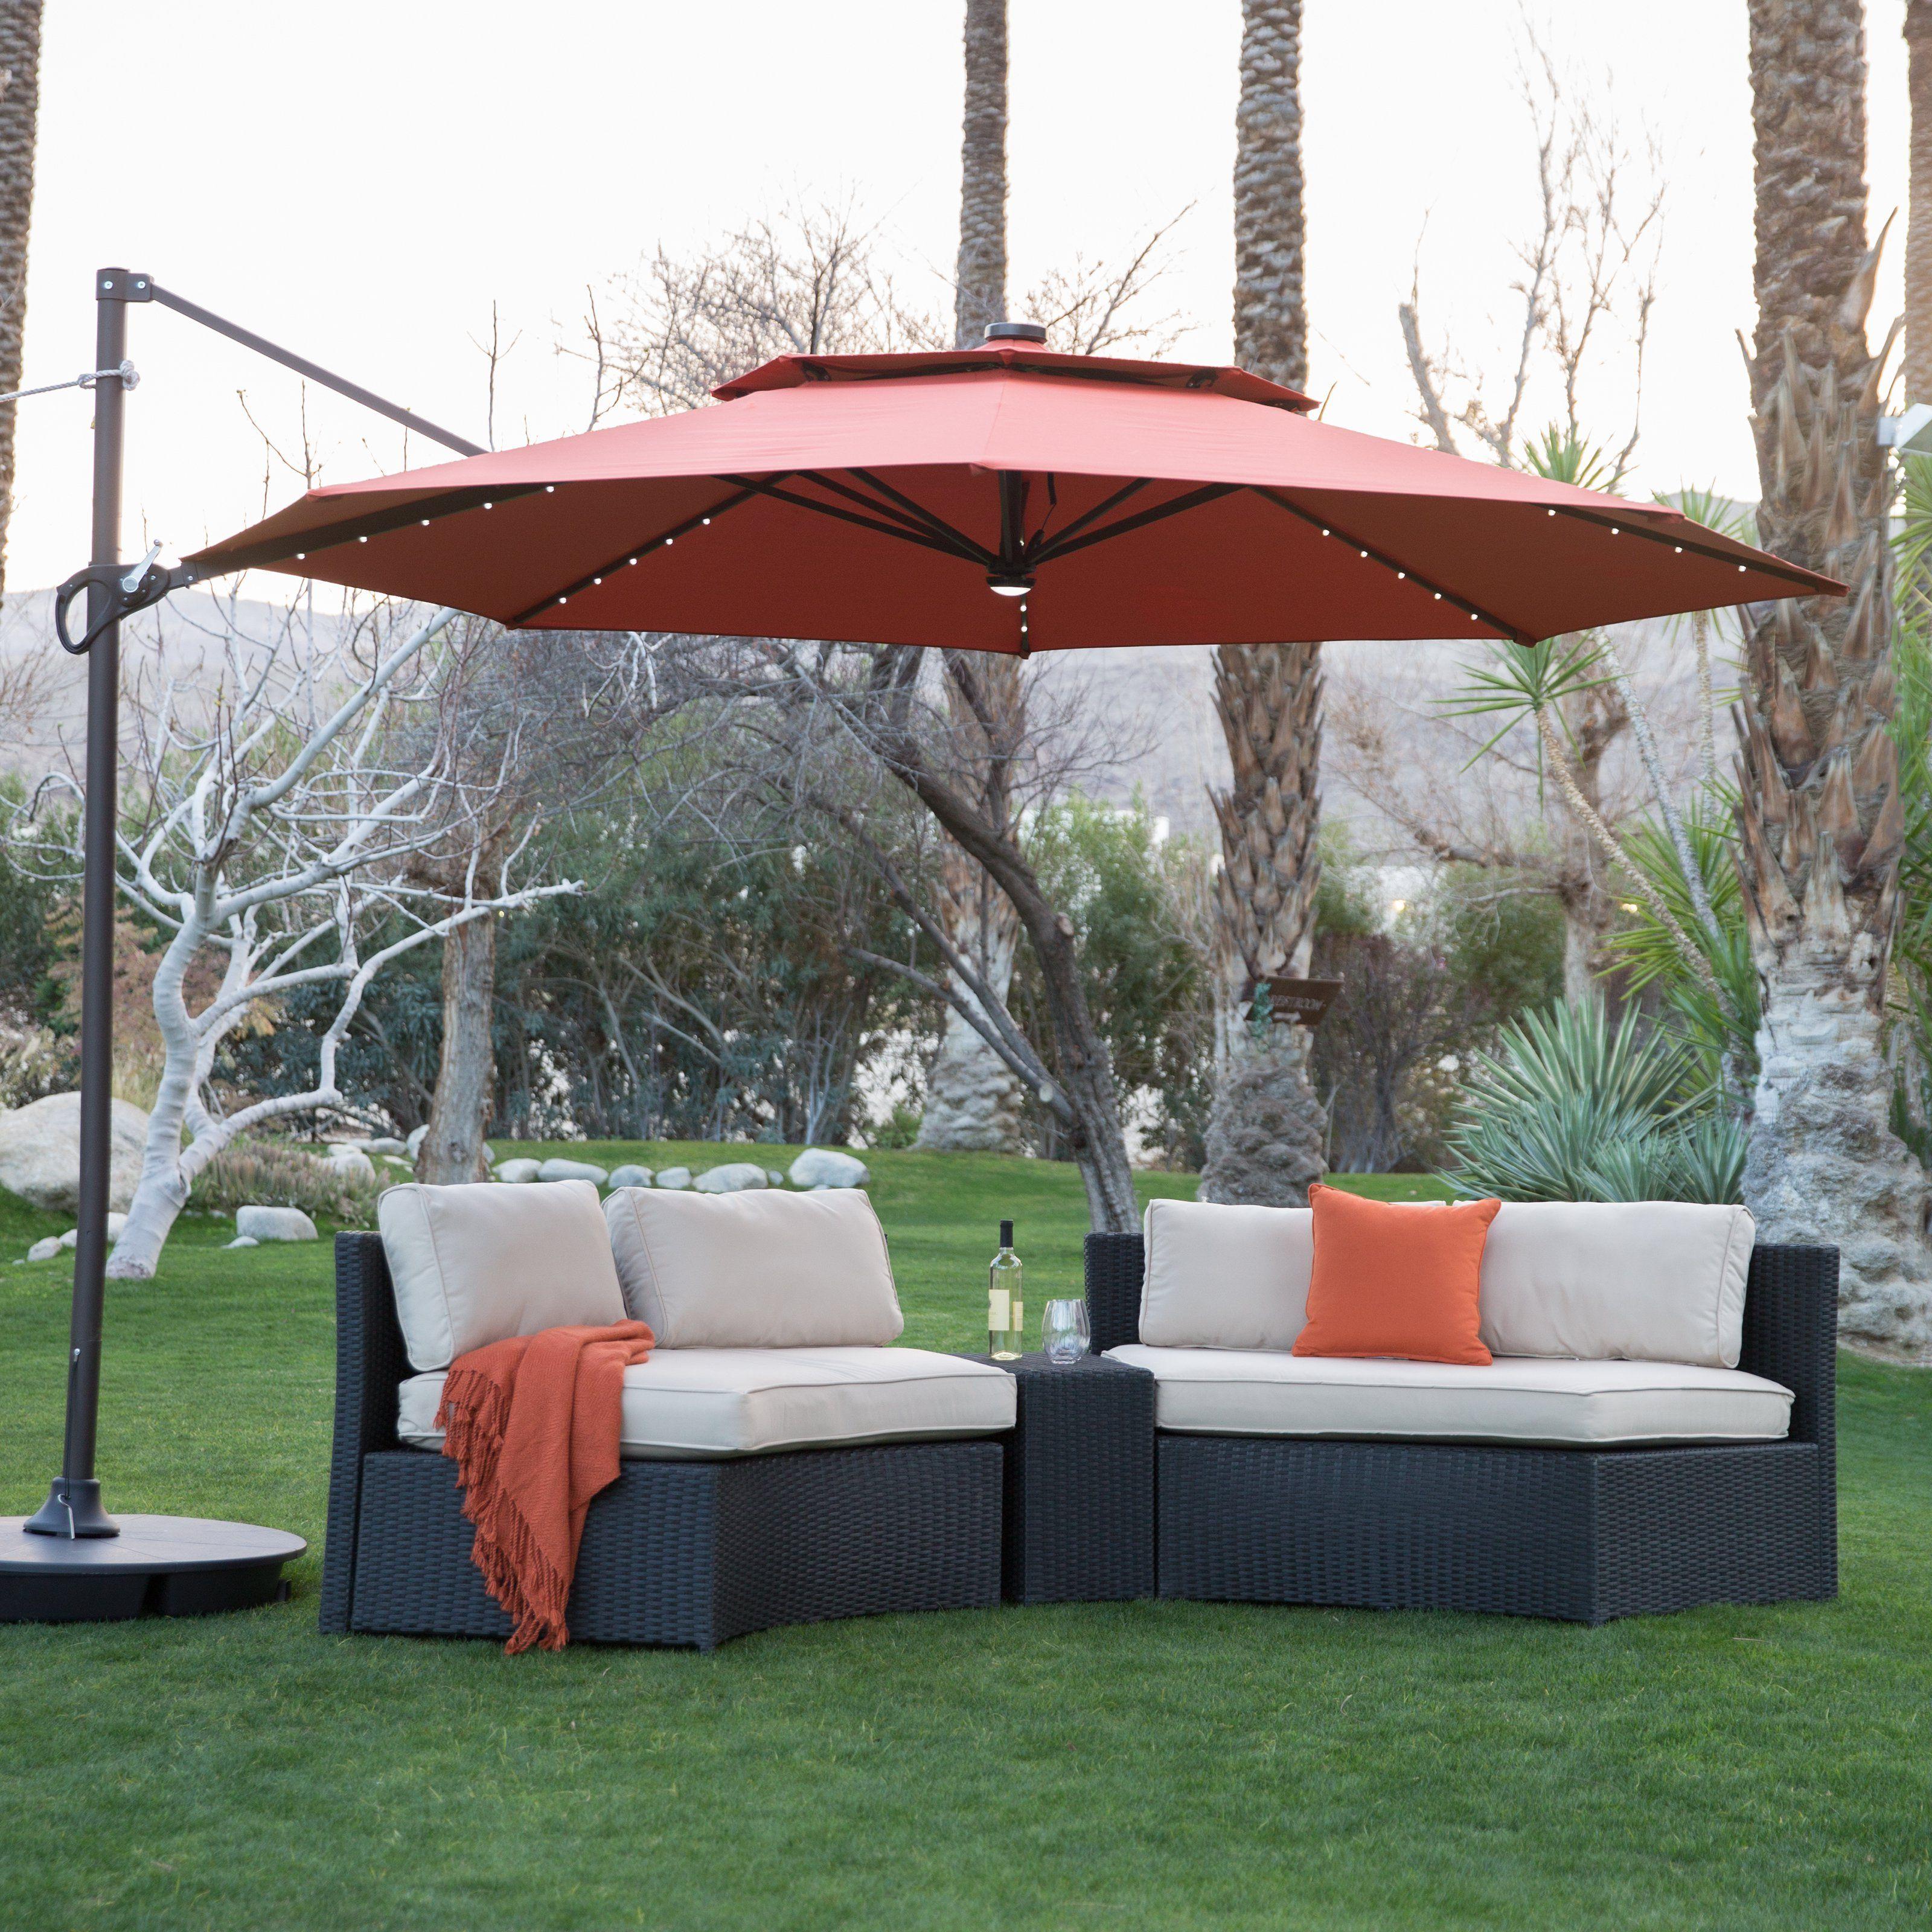 Garden decor kijiji  Coral Coast  ft Steel Lighted Offset Patio Umbrella u Base  from